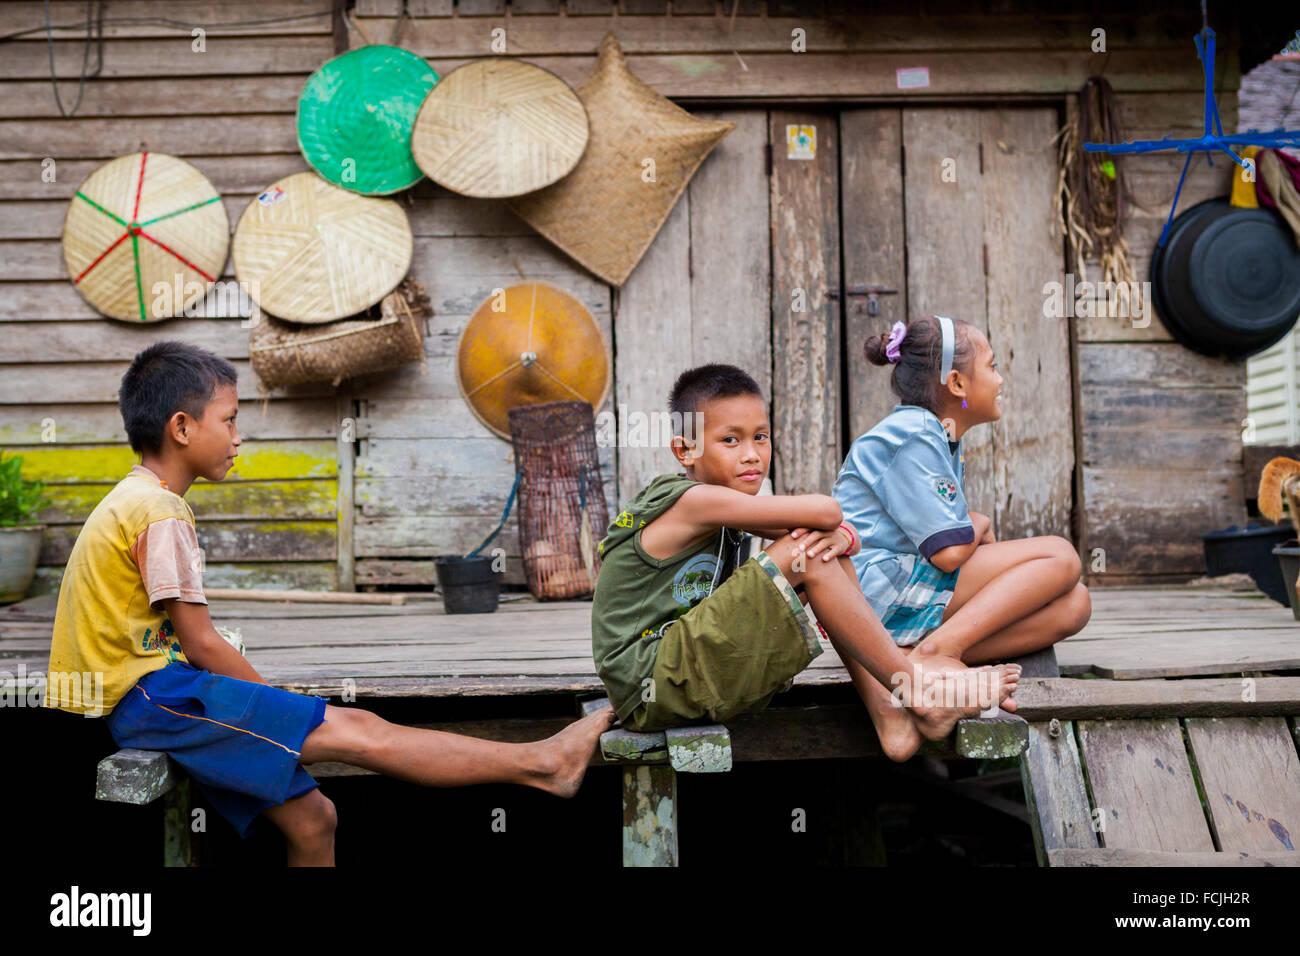 Dayaknese children gather on free time in remote district of Kapuas Hulu, West Kalimantan, Indonesia. © Reynold - Stock Image